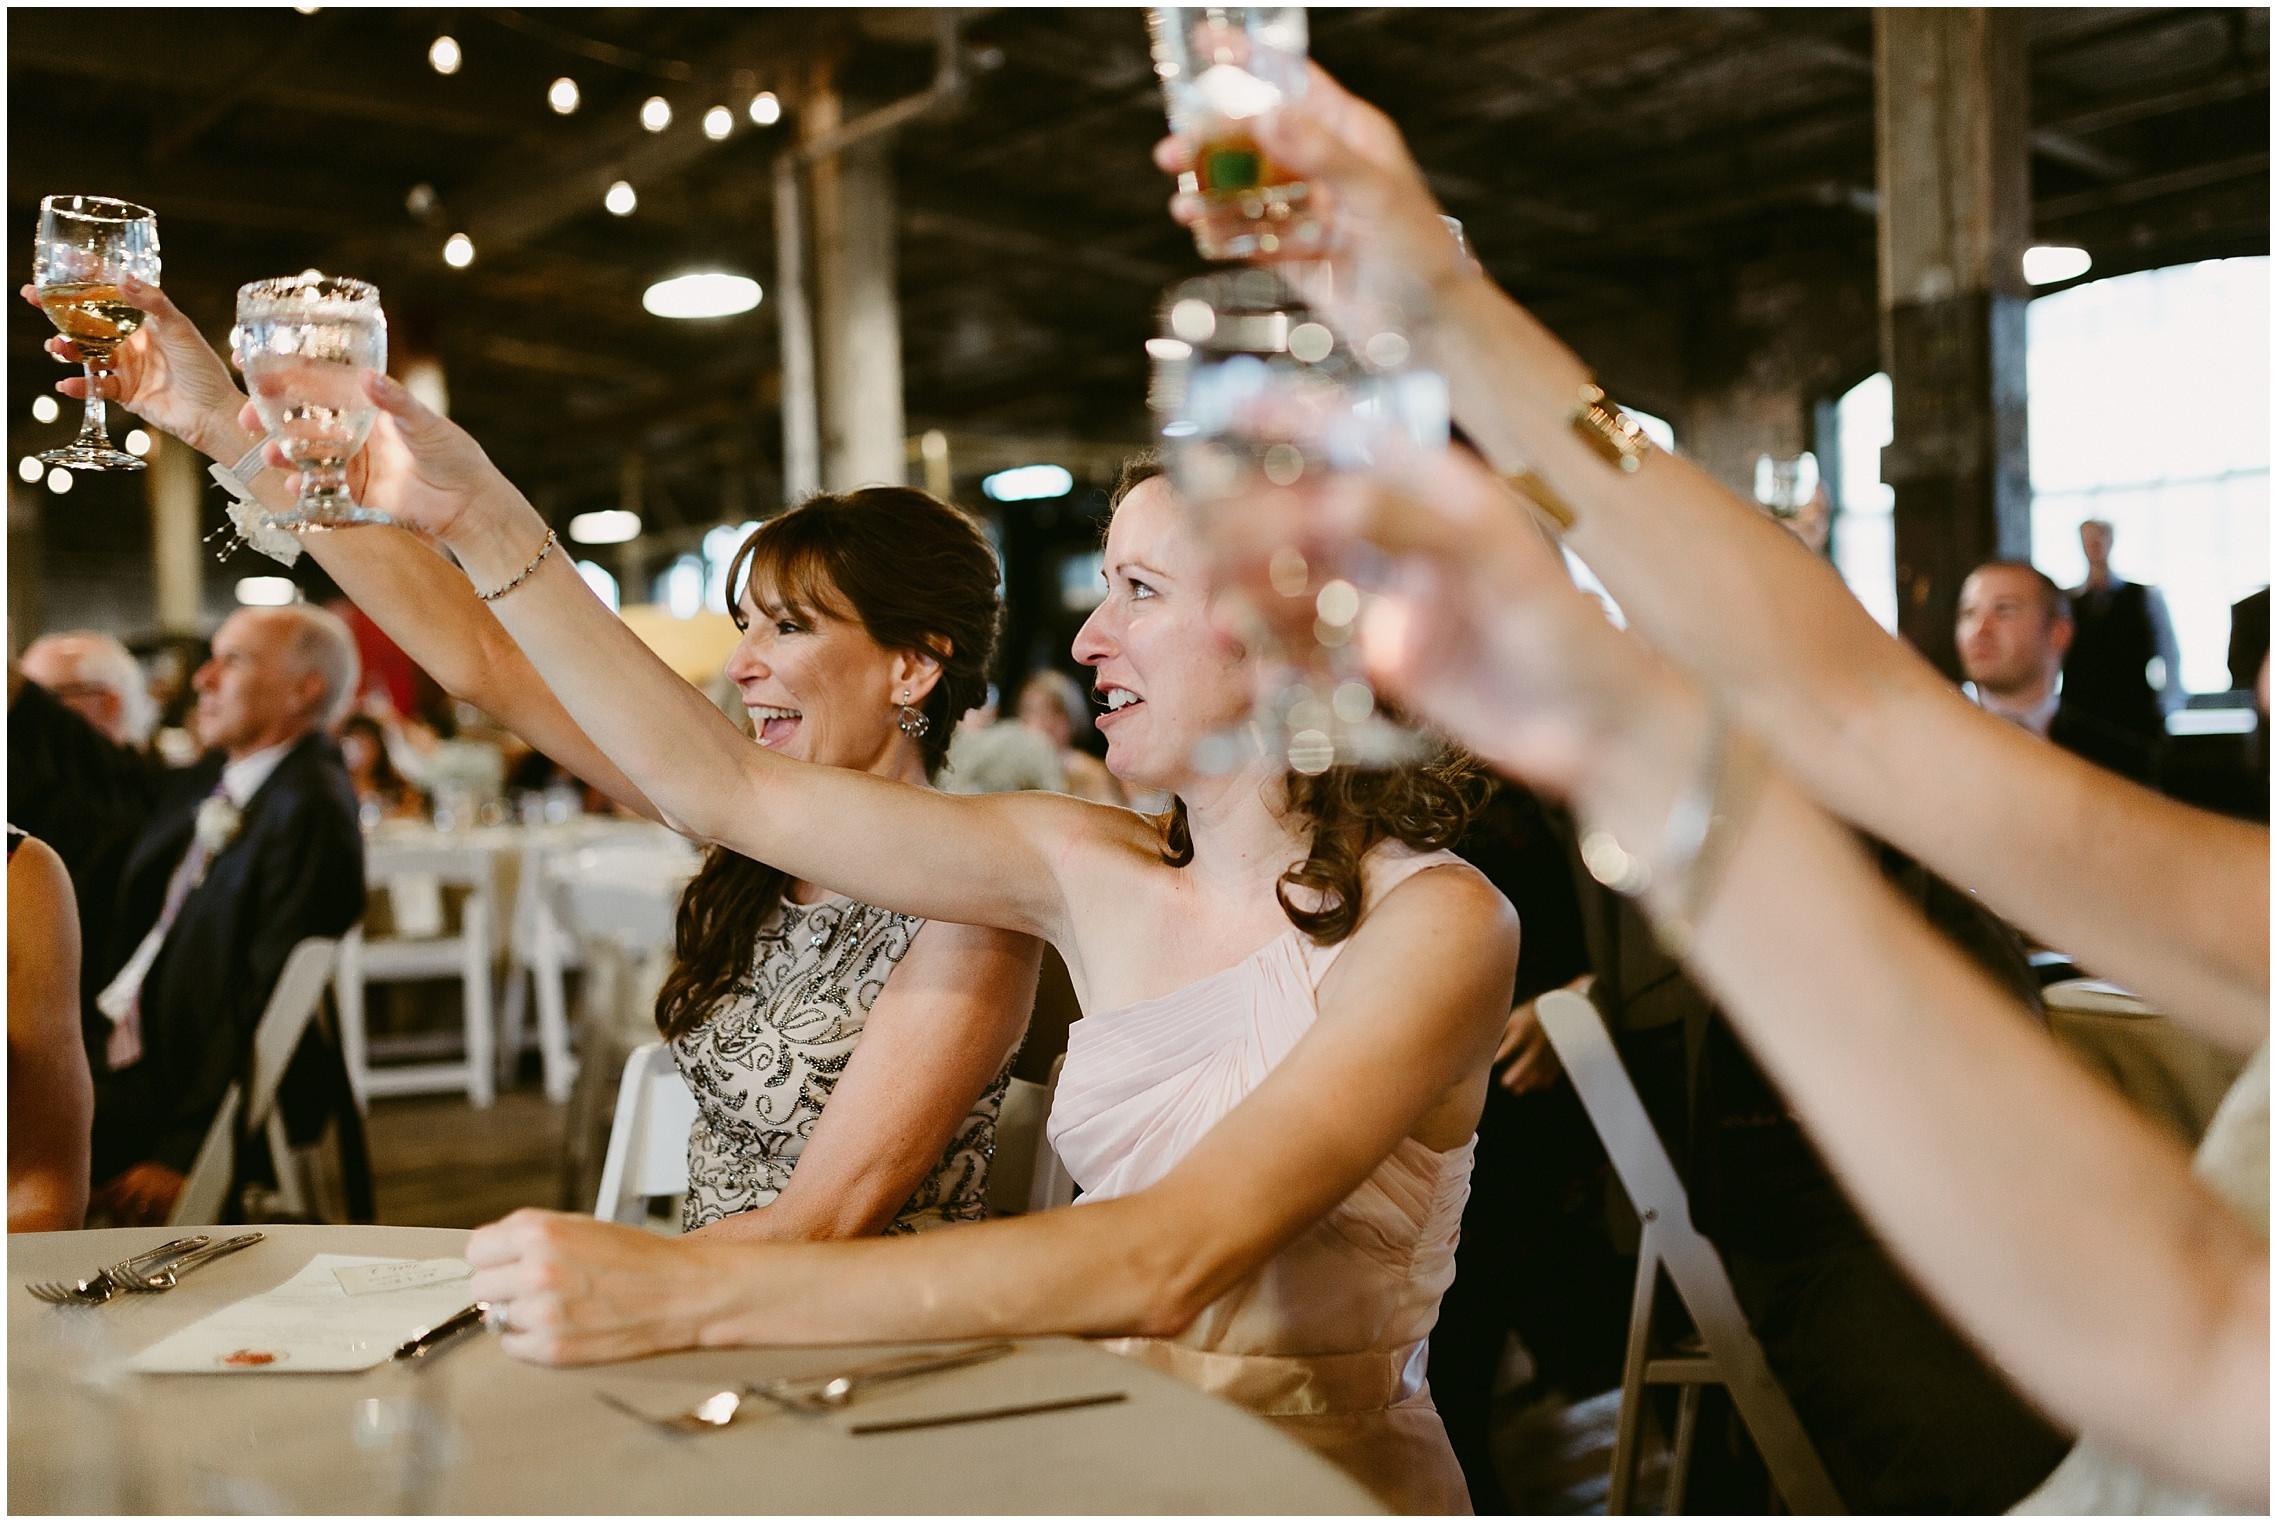 brick_and_mortar_colorado_wedding_photographer_0262.jpg